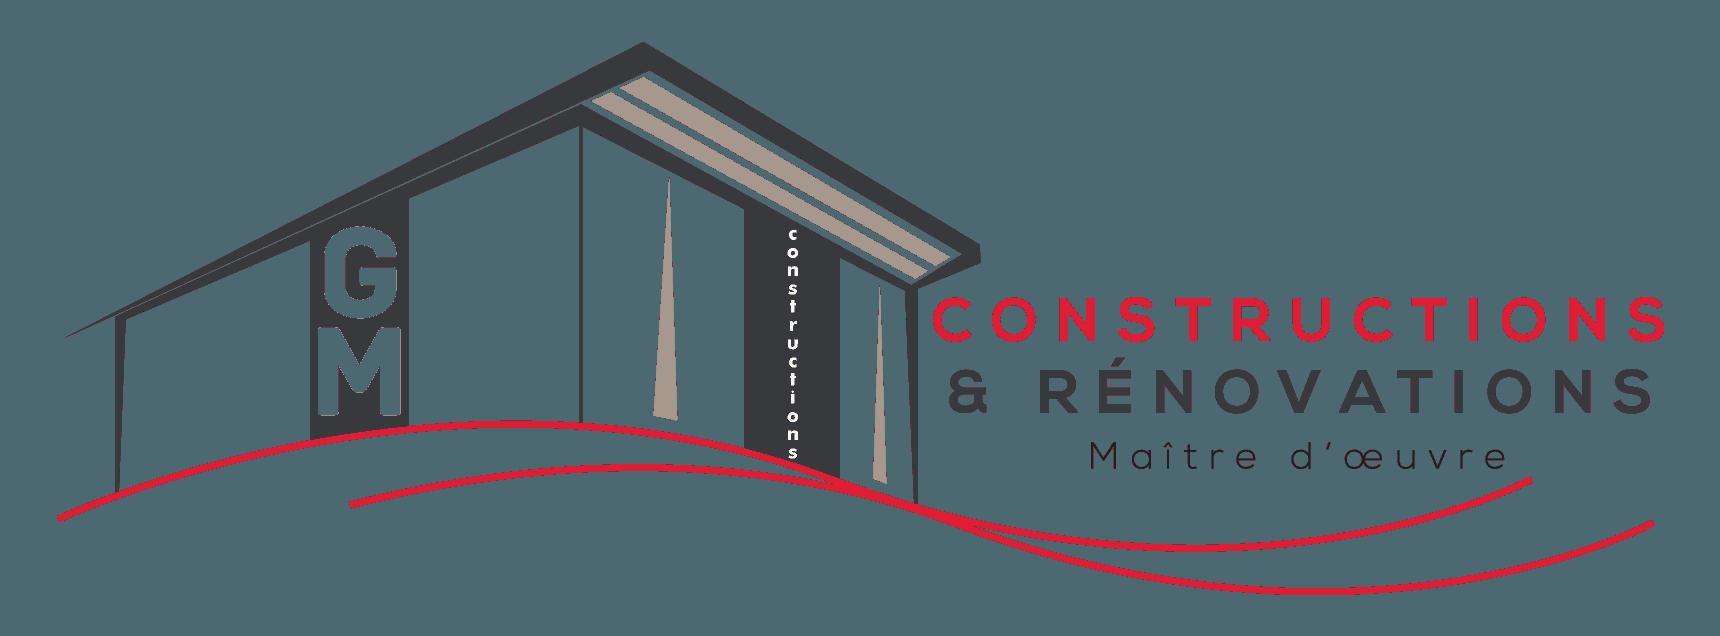 GM CONSTRUCTIONS ET RENOVATIONS